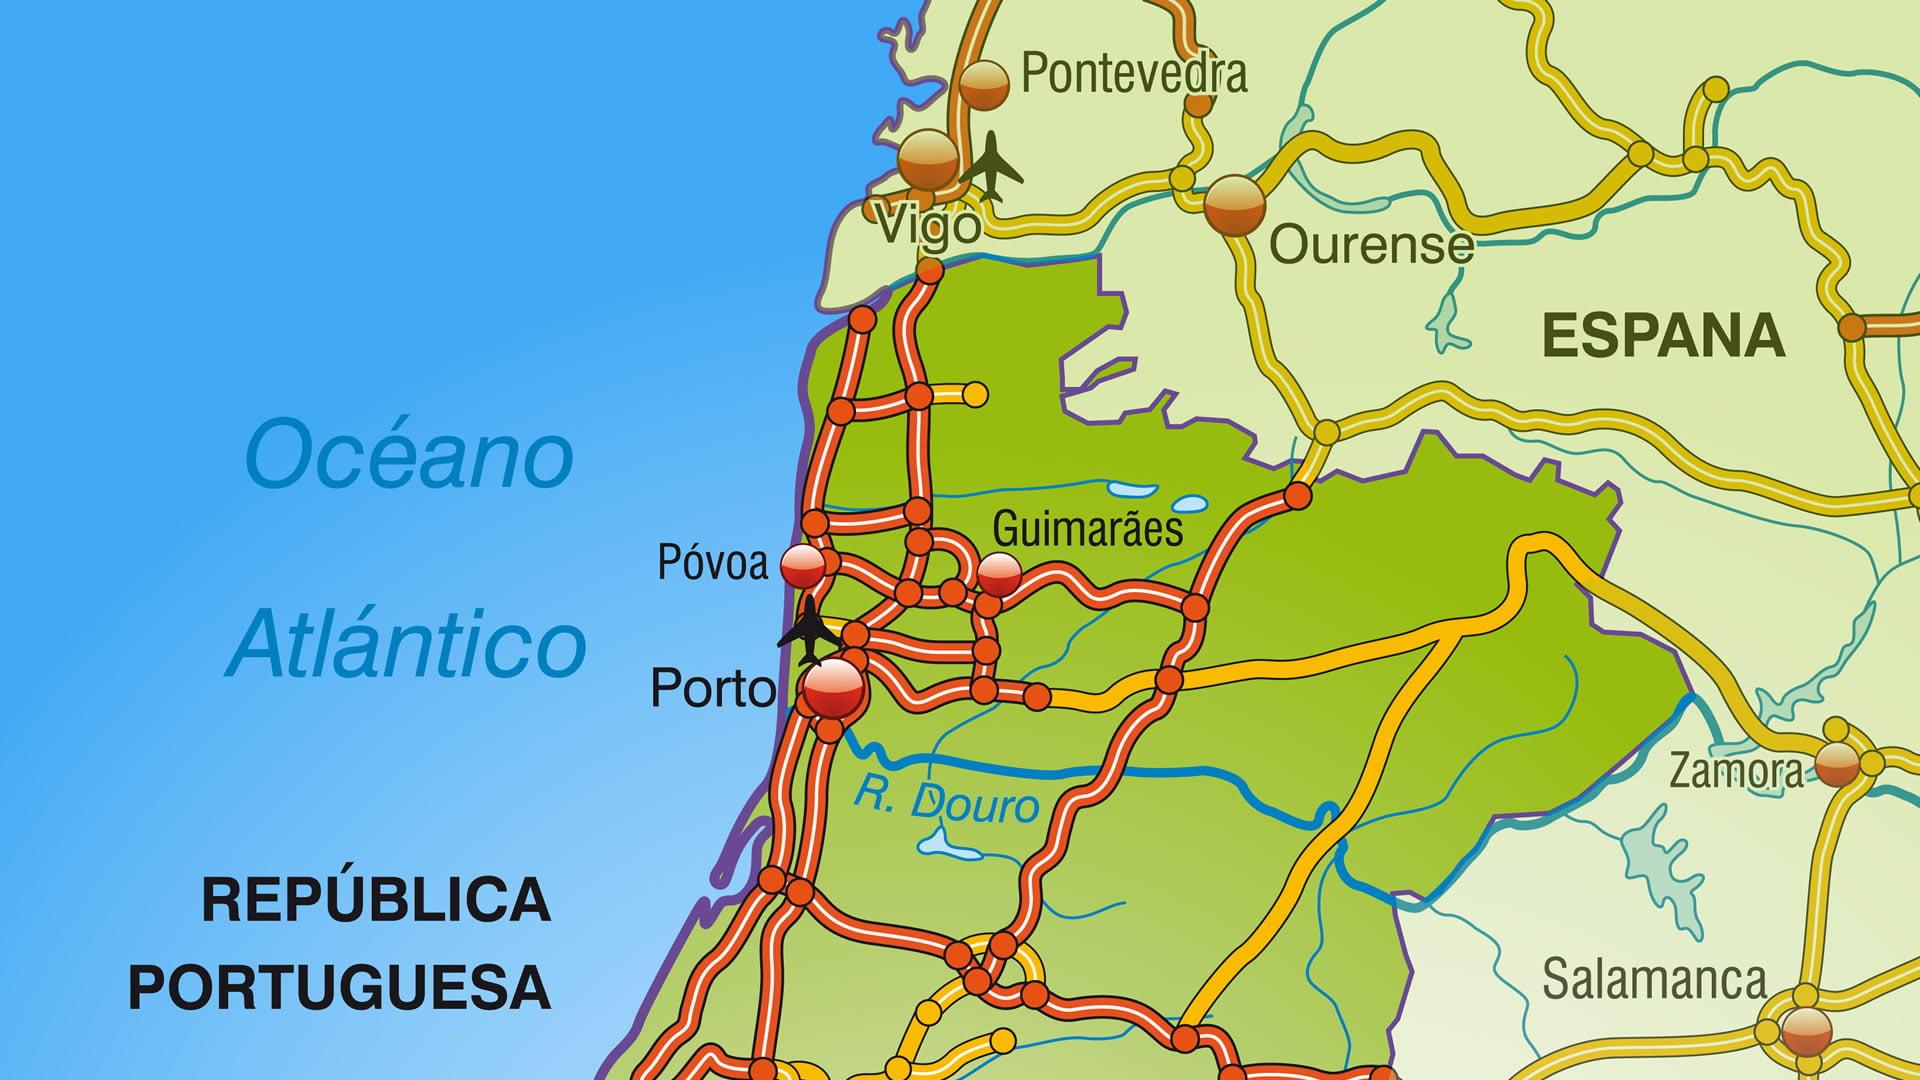 mapa norte de portugal turismo Mapa de autovías de Portugal: zona norte mapa norte de portugal turismo